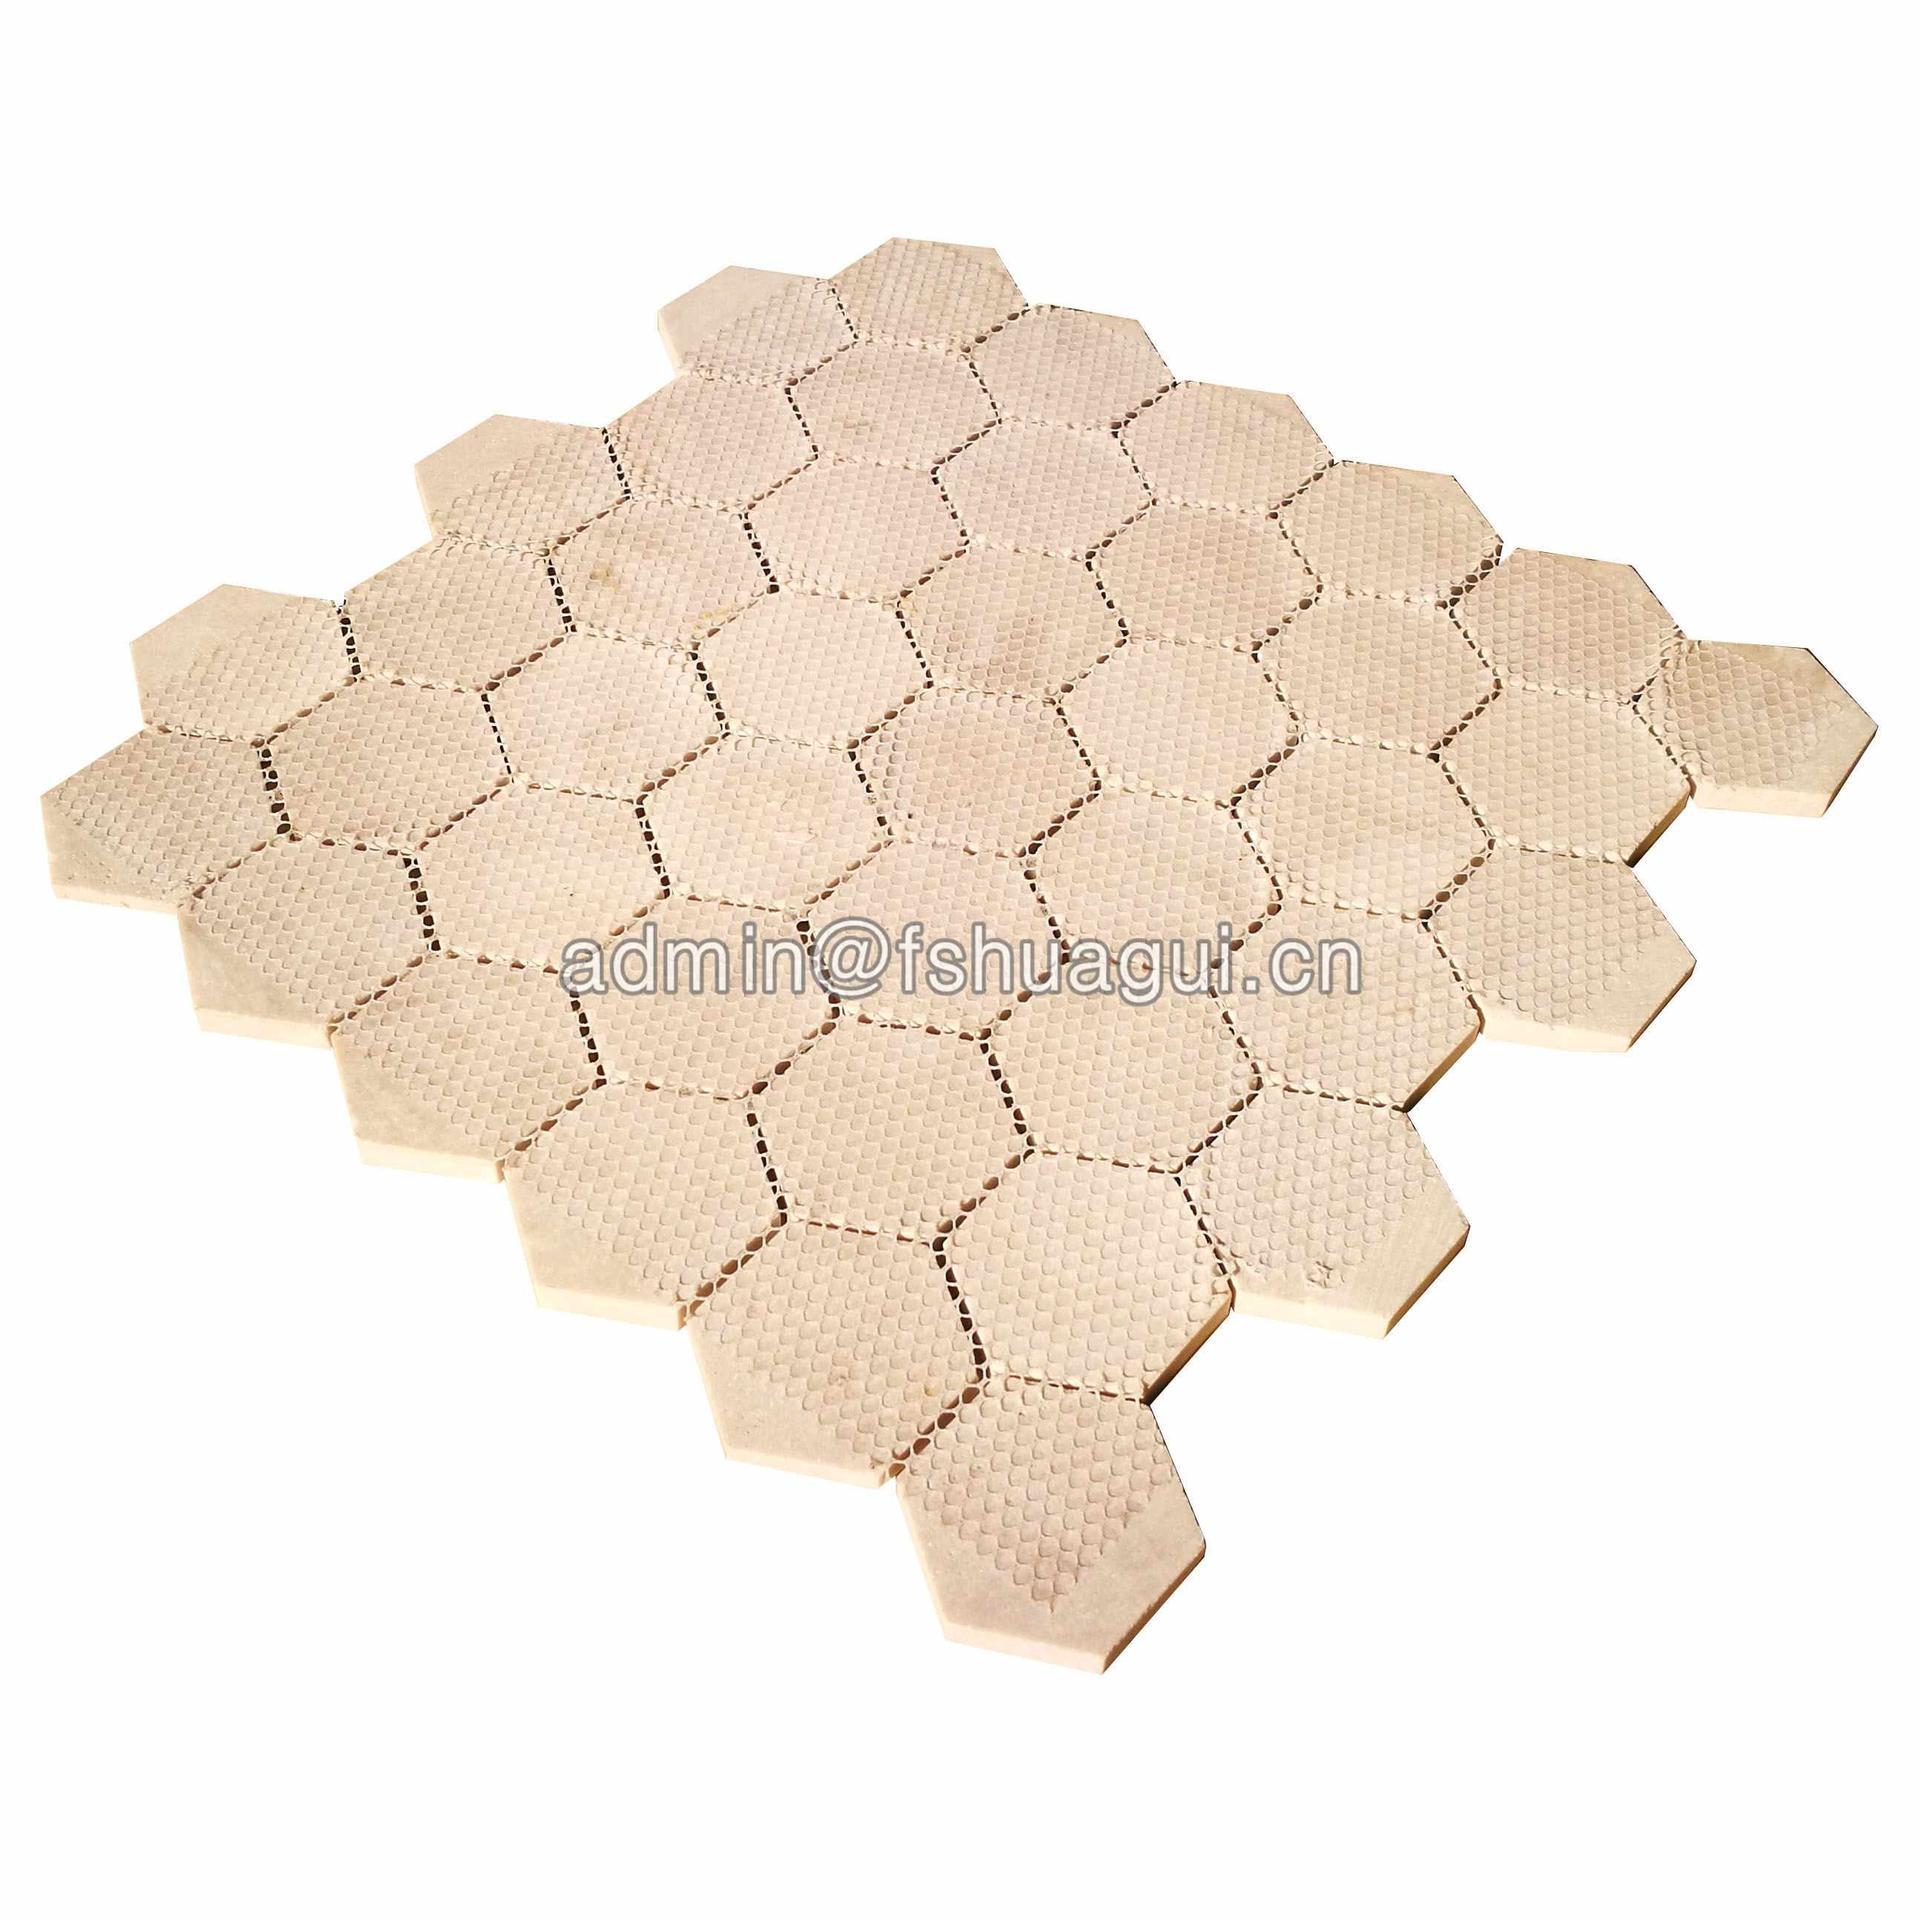 Classic 3D effect marble hexagon stone mosaic tile